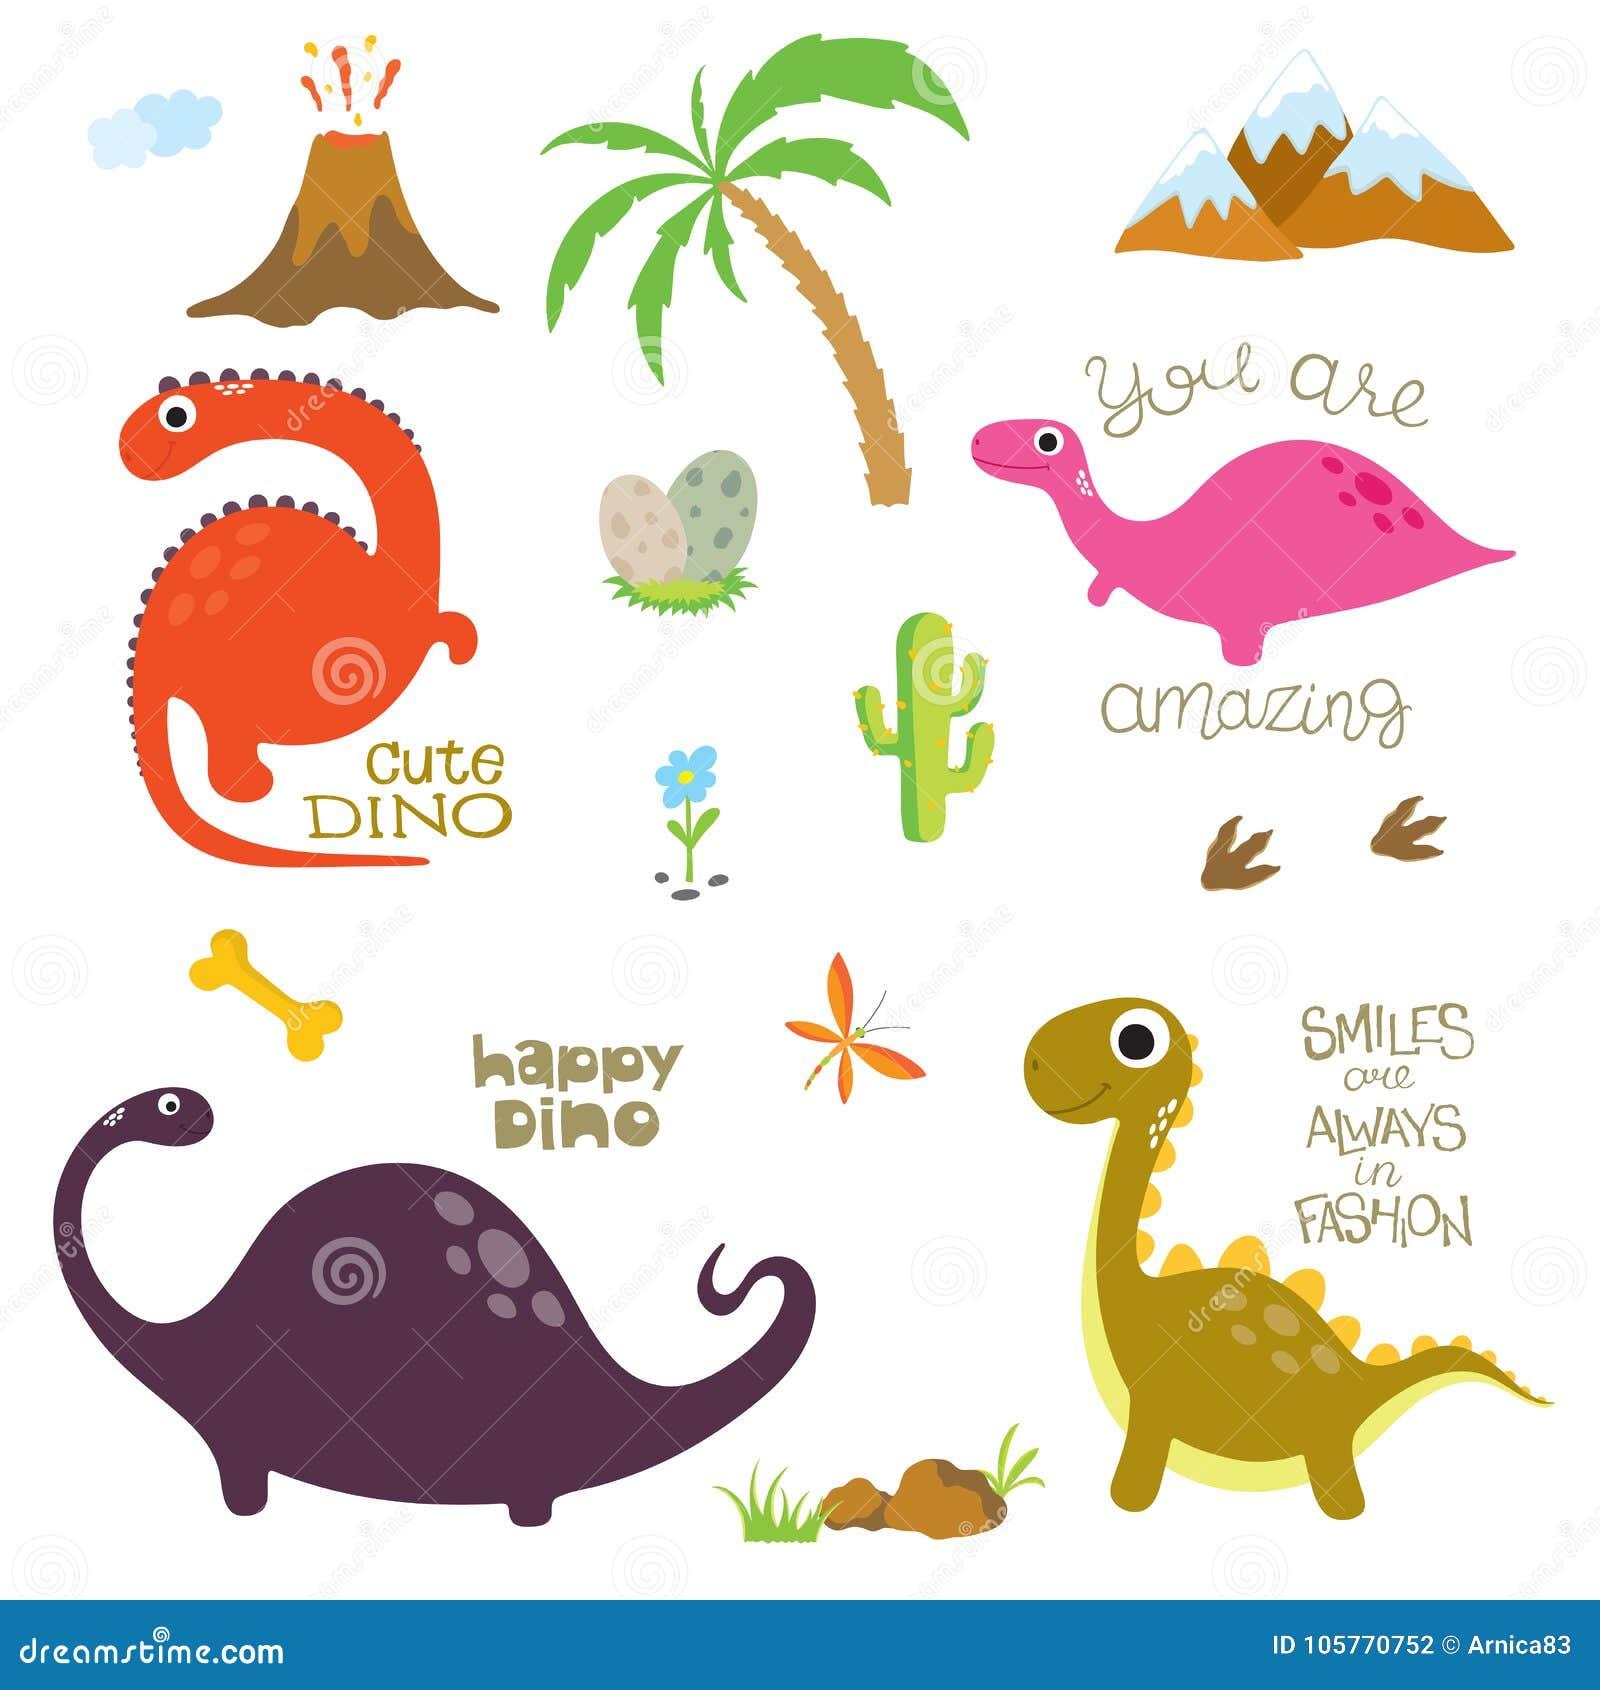 Dinosaurusvoetafdruk, Vulkaan, Palm, Stenen, Been en Cactus